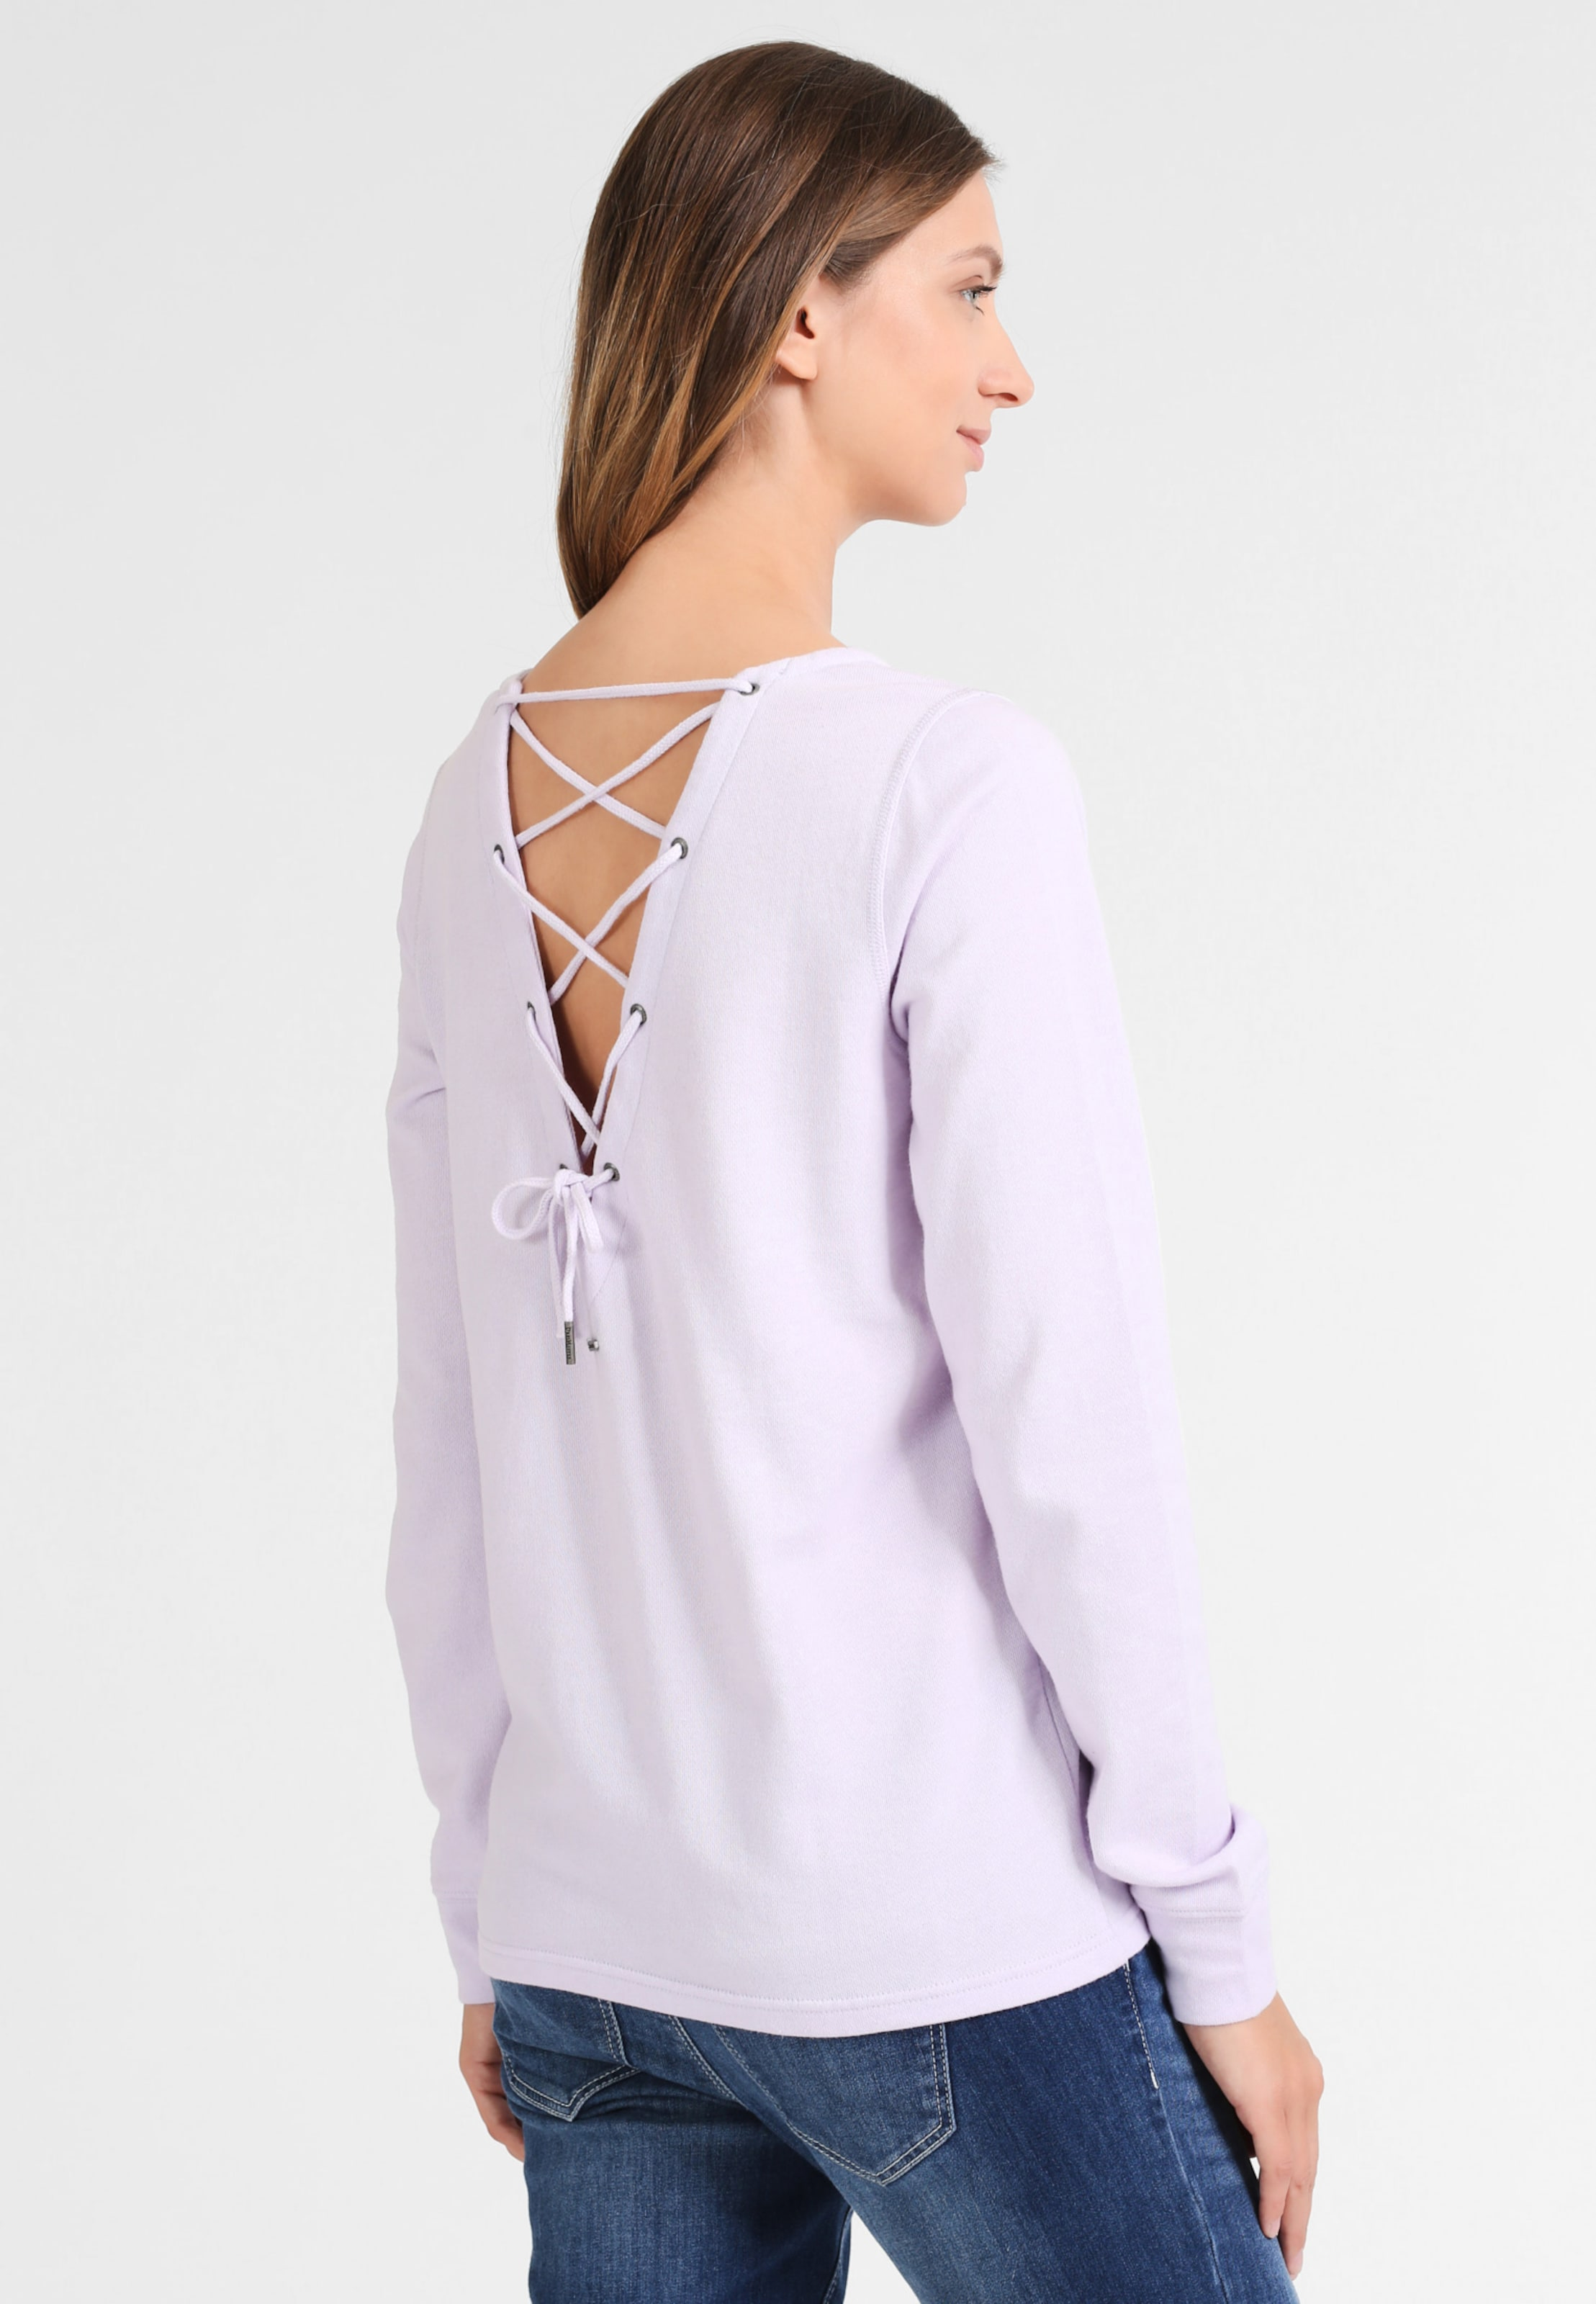 Dreimaster shirt En Sweat Violet Pastel jVLqzSpUMG